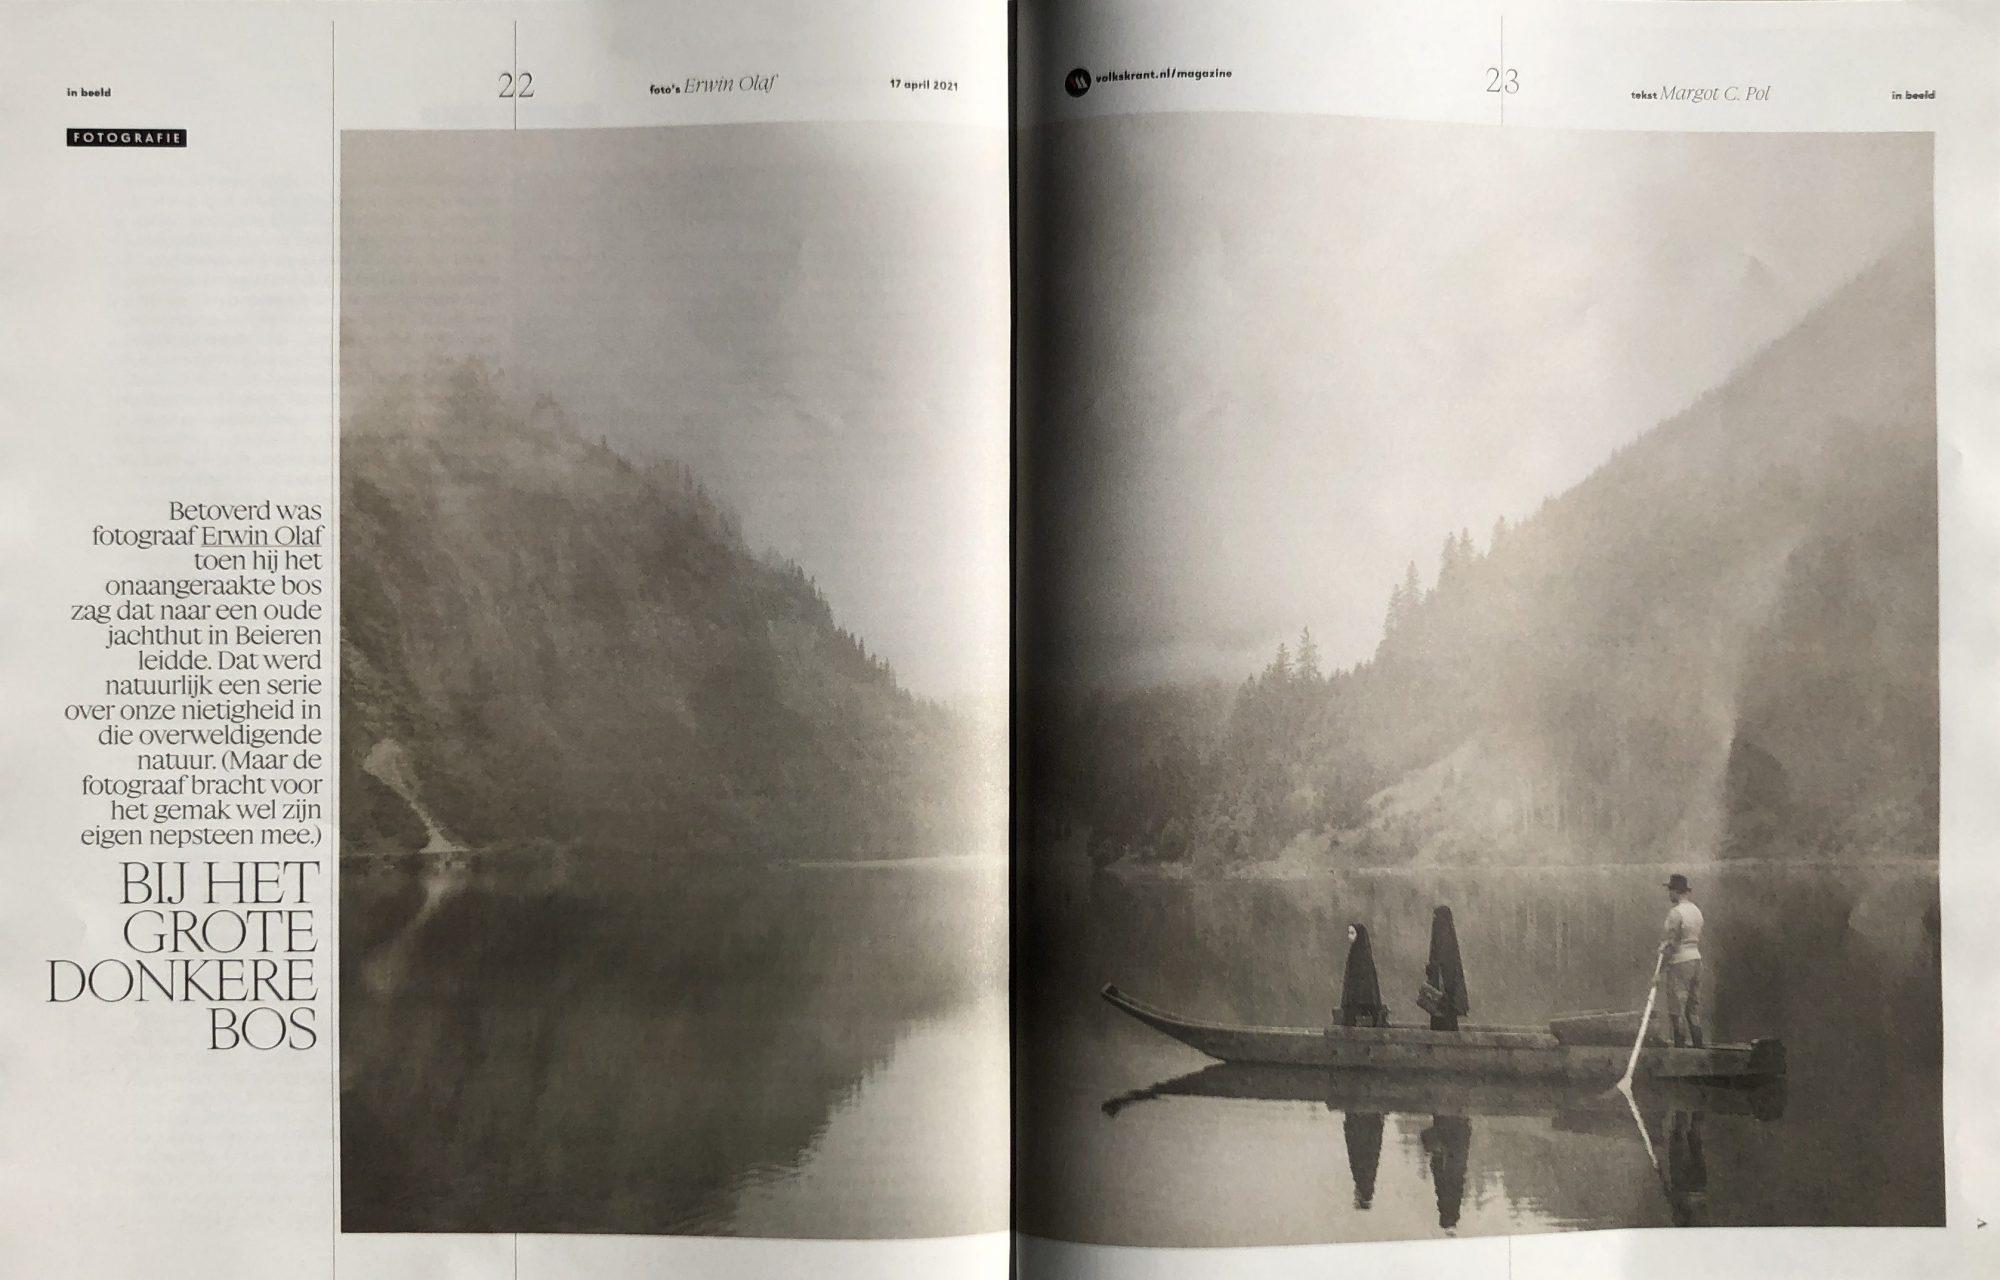 De Volkskrant: Fotoreportage over Erwin Olaf